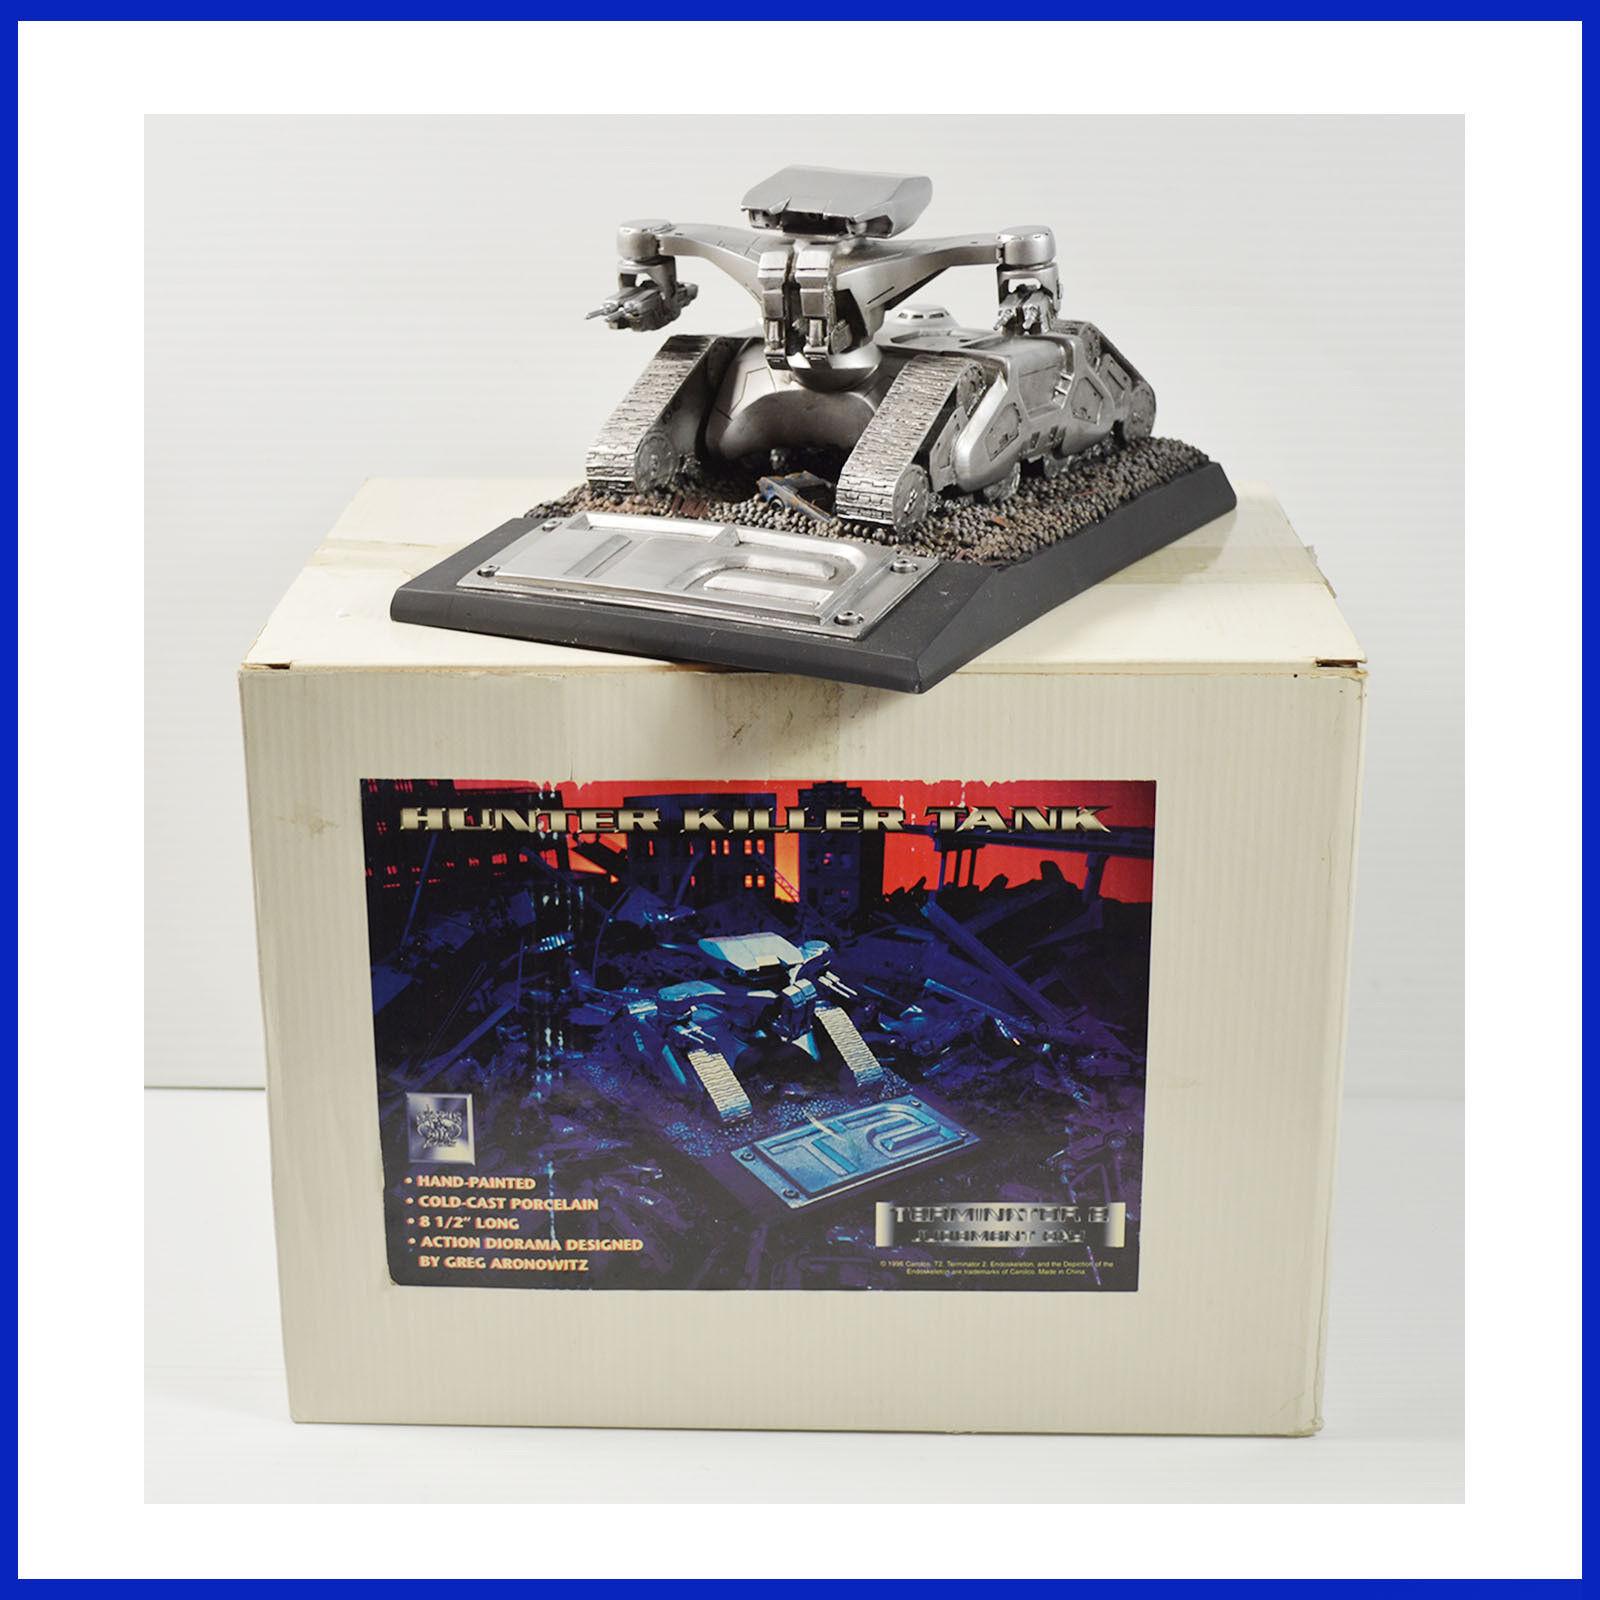 1996 Legends in 3D Hunter Killer Tank Terminator 2 JudgSiet Day New in the Box